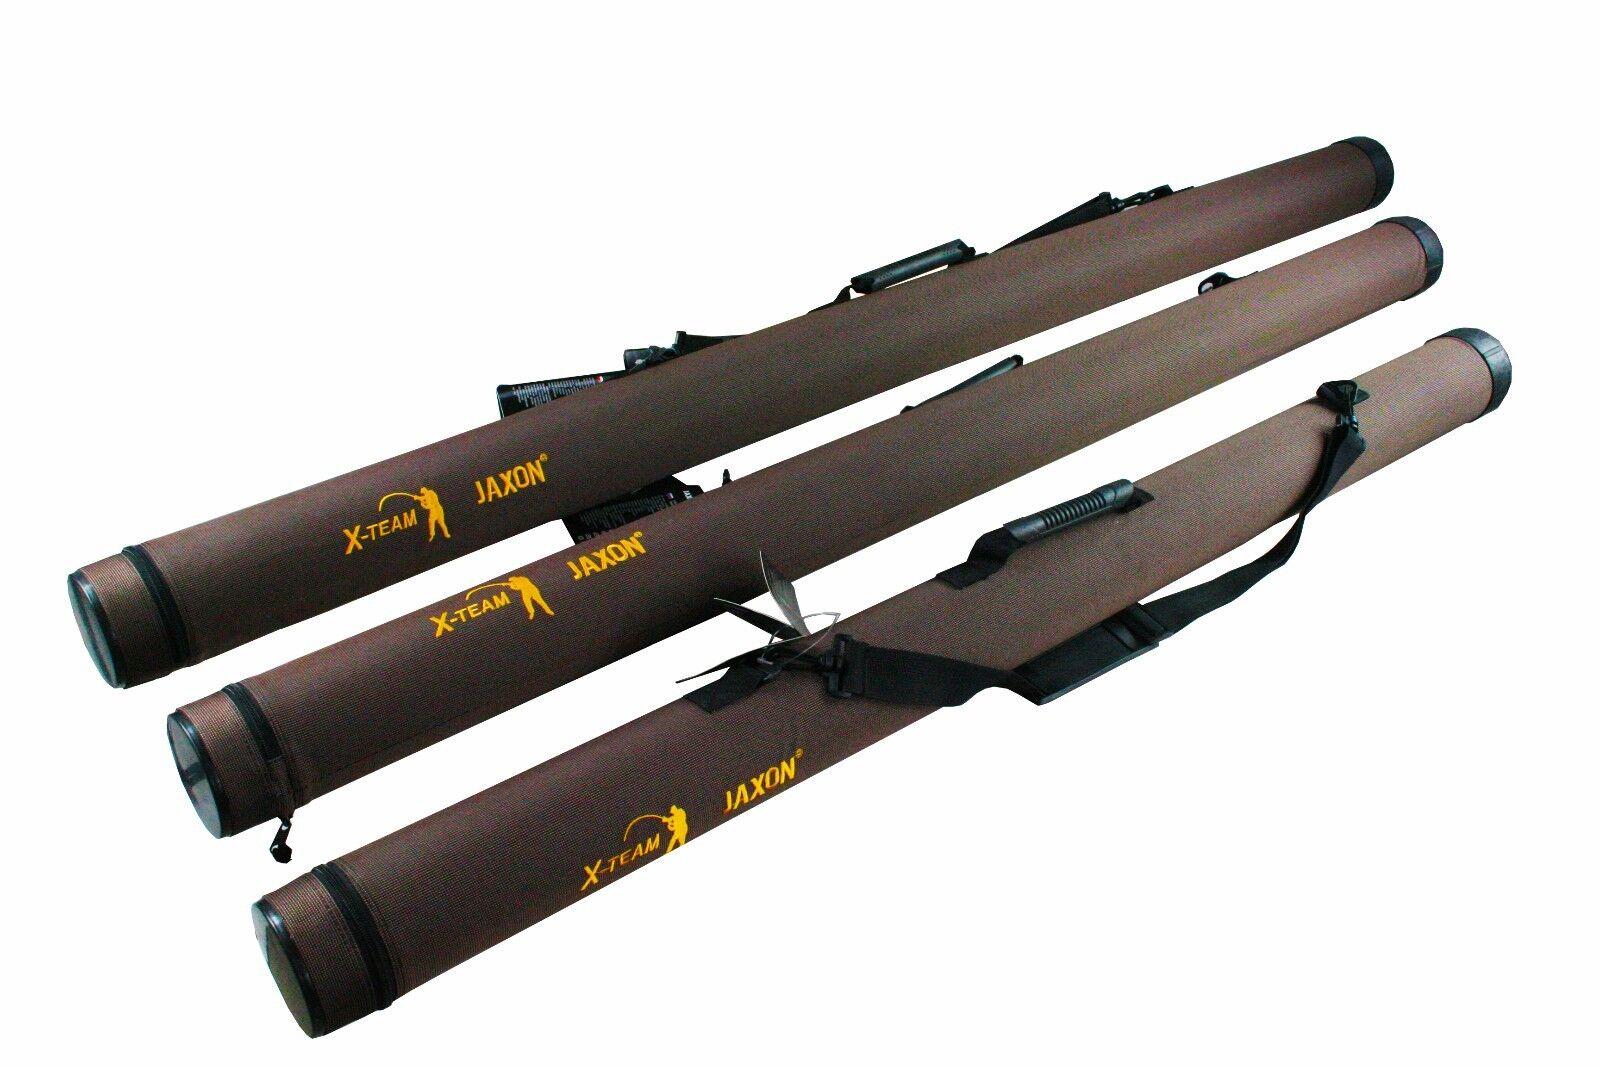 Jaxon Ruten-Transportrohr Rutenrohr Rod Bag Hardcase Sheath 130-215cm Top